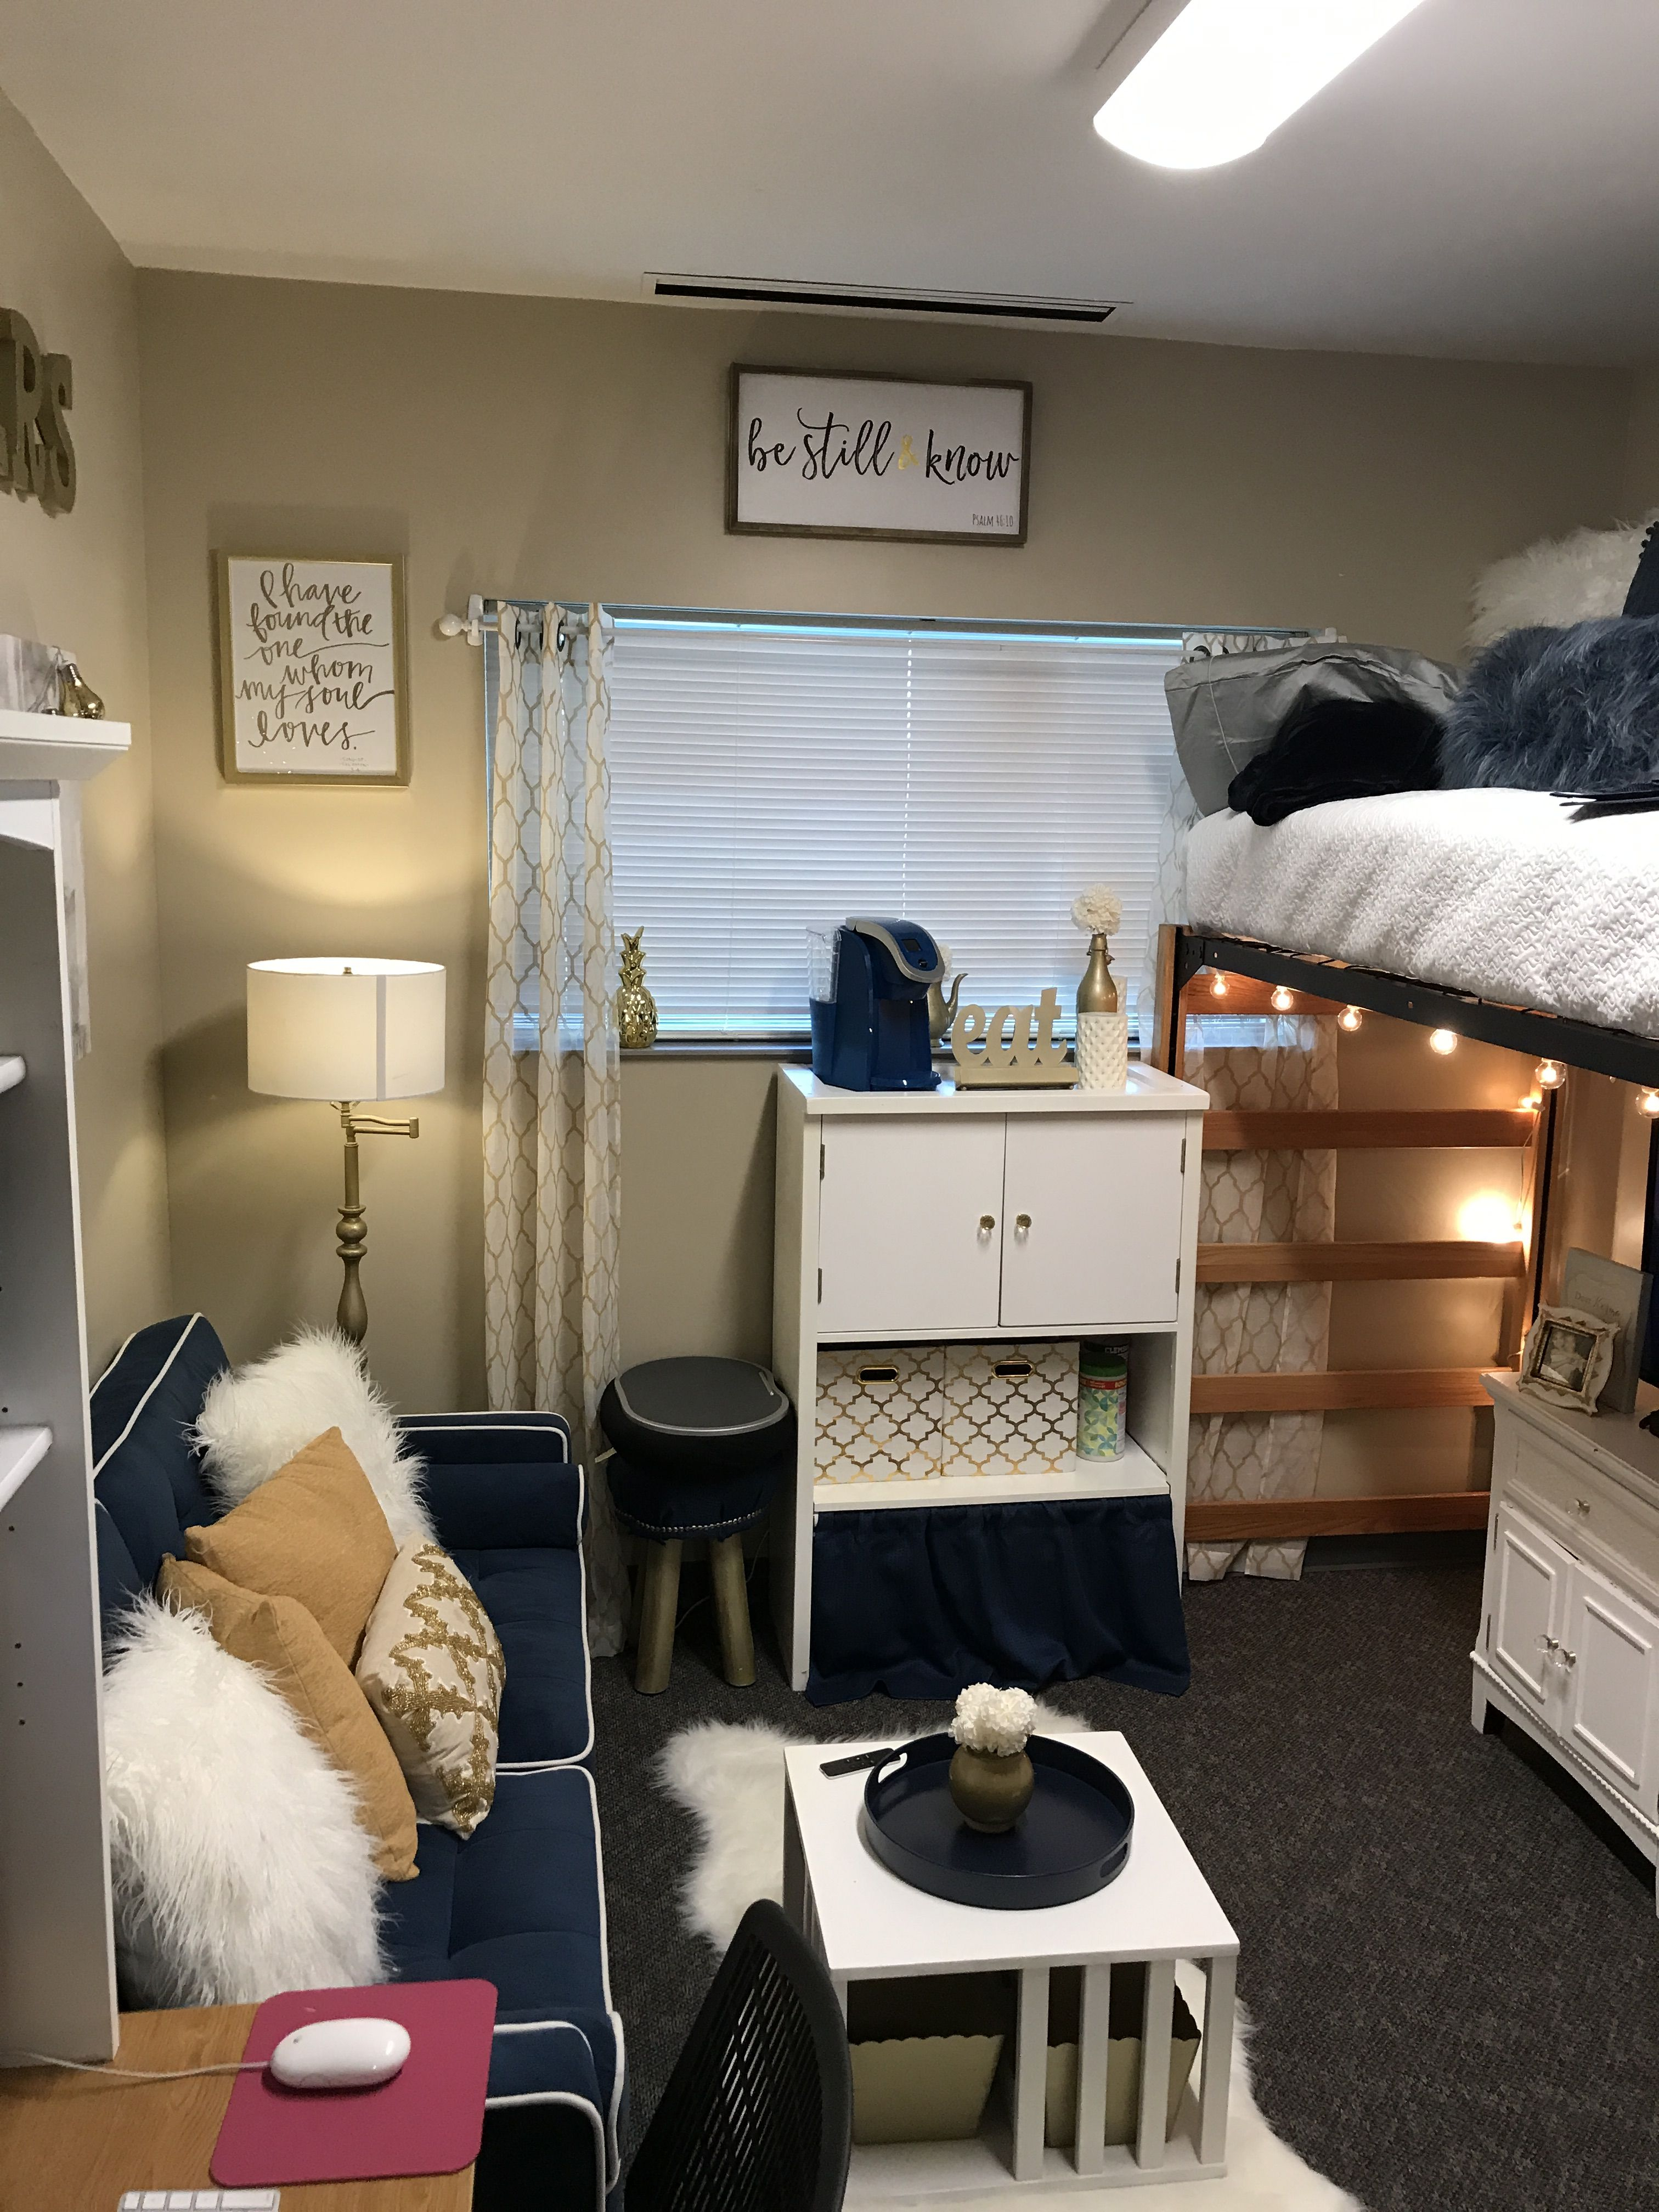 Cool dorm rooms loft beds ideas decorations bedroom designs also best dorms images in diy for home rh pinterest